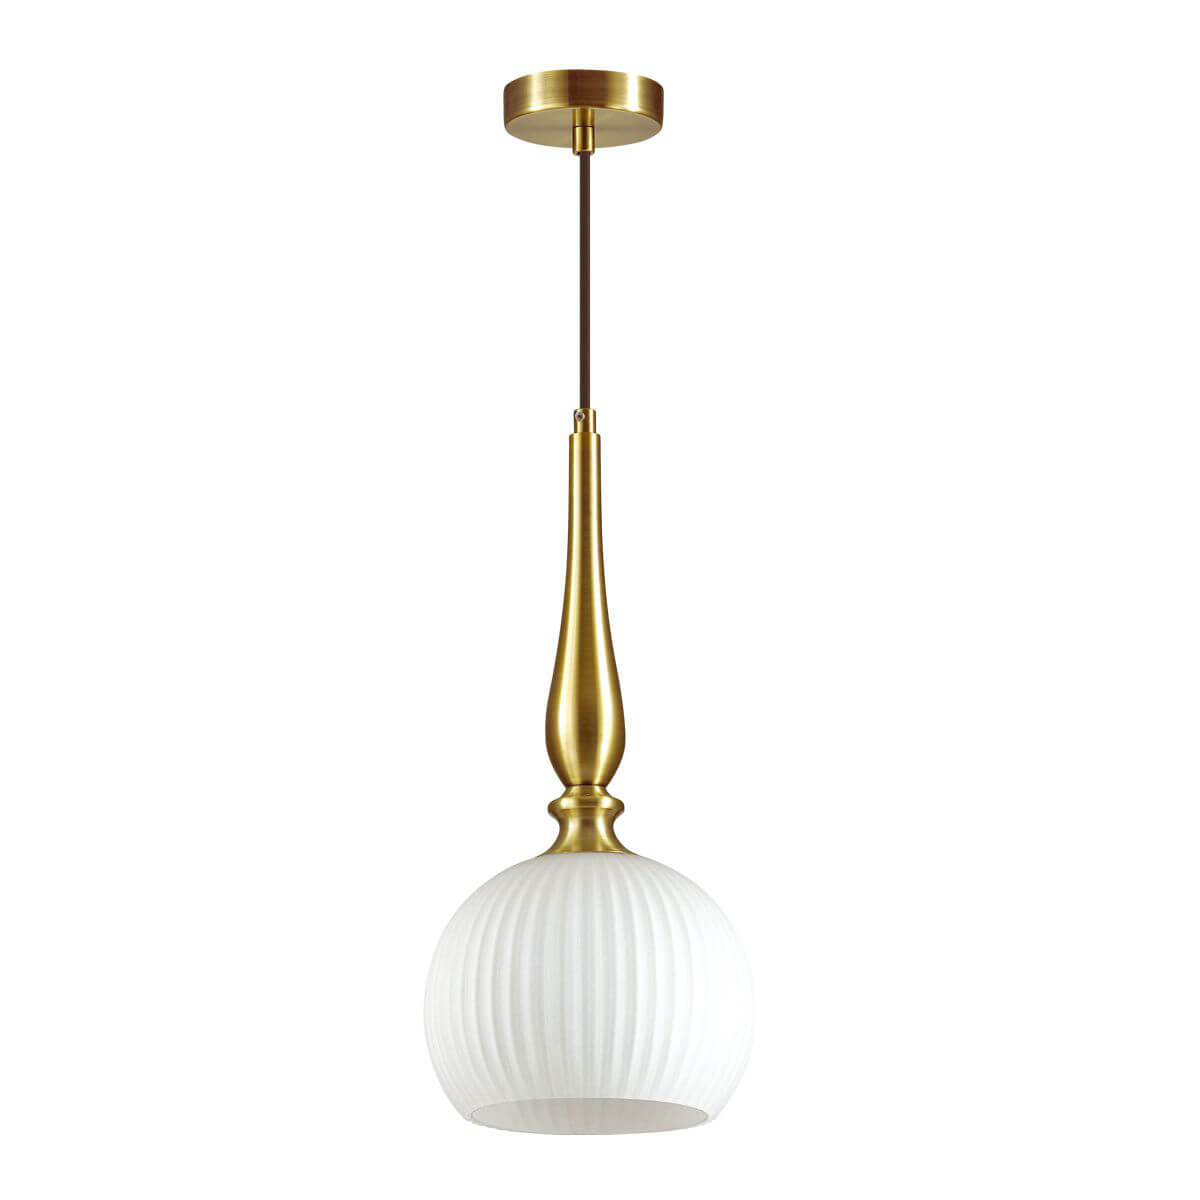 Светильник Odeon Light 4767/1 Pendant